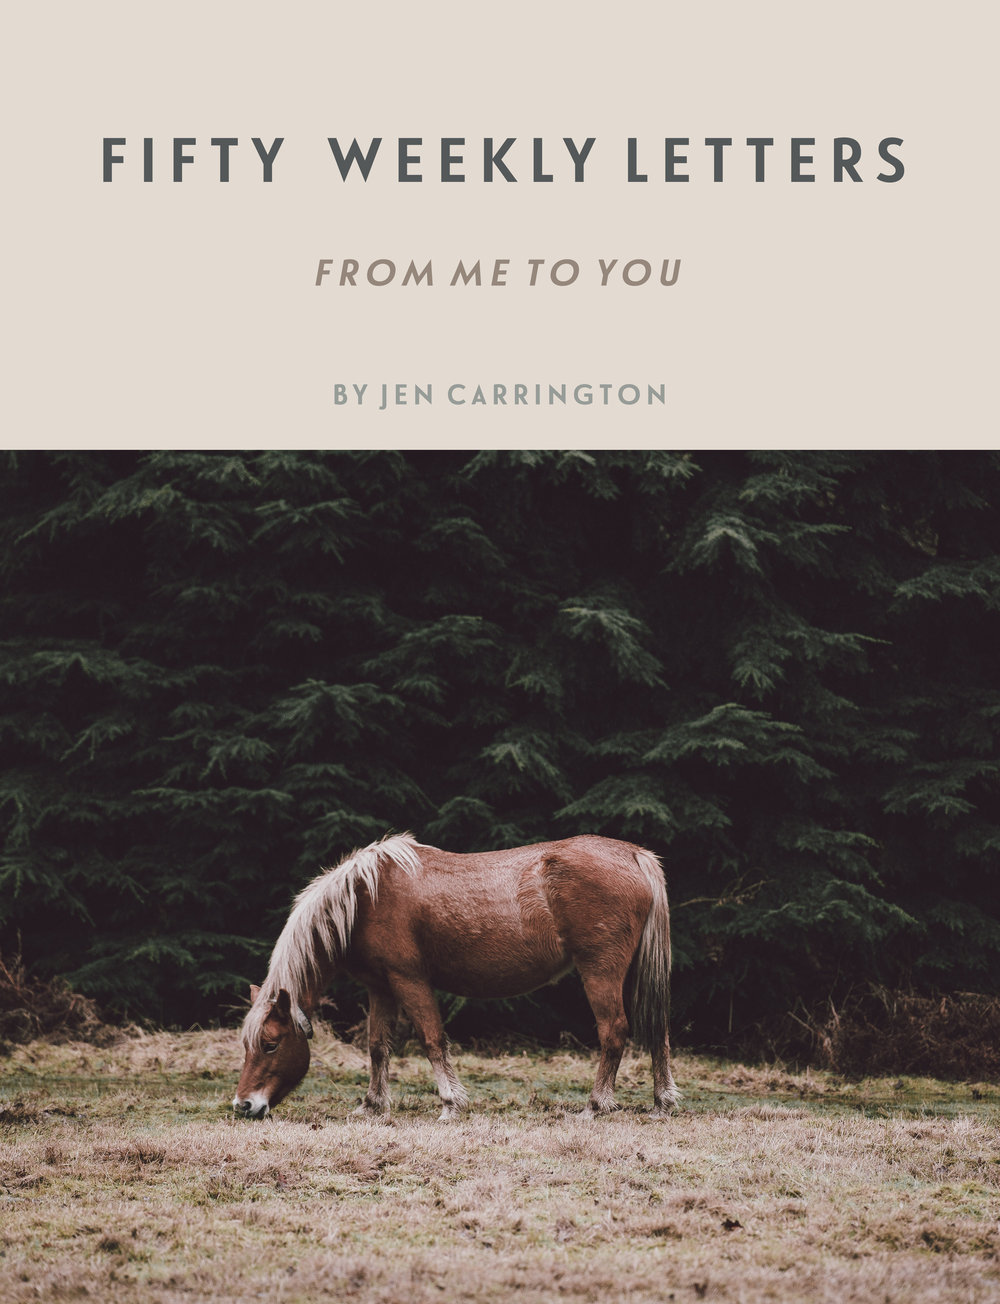 fiftyweeklyletters.jpg